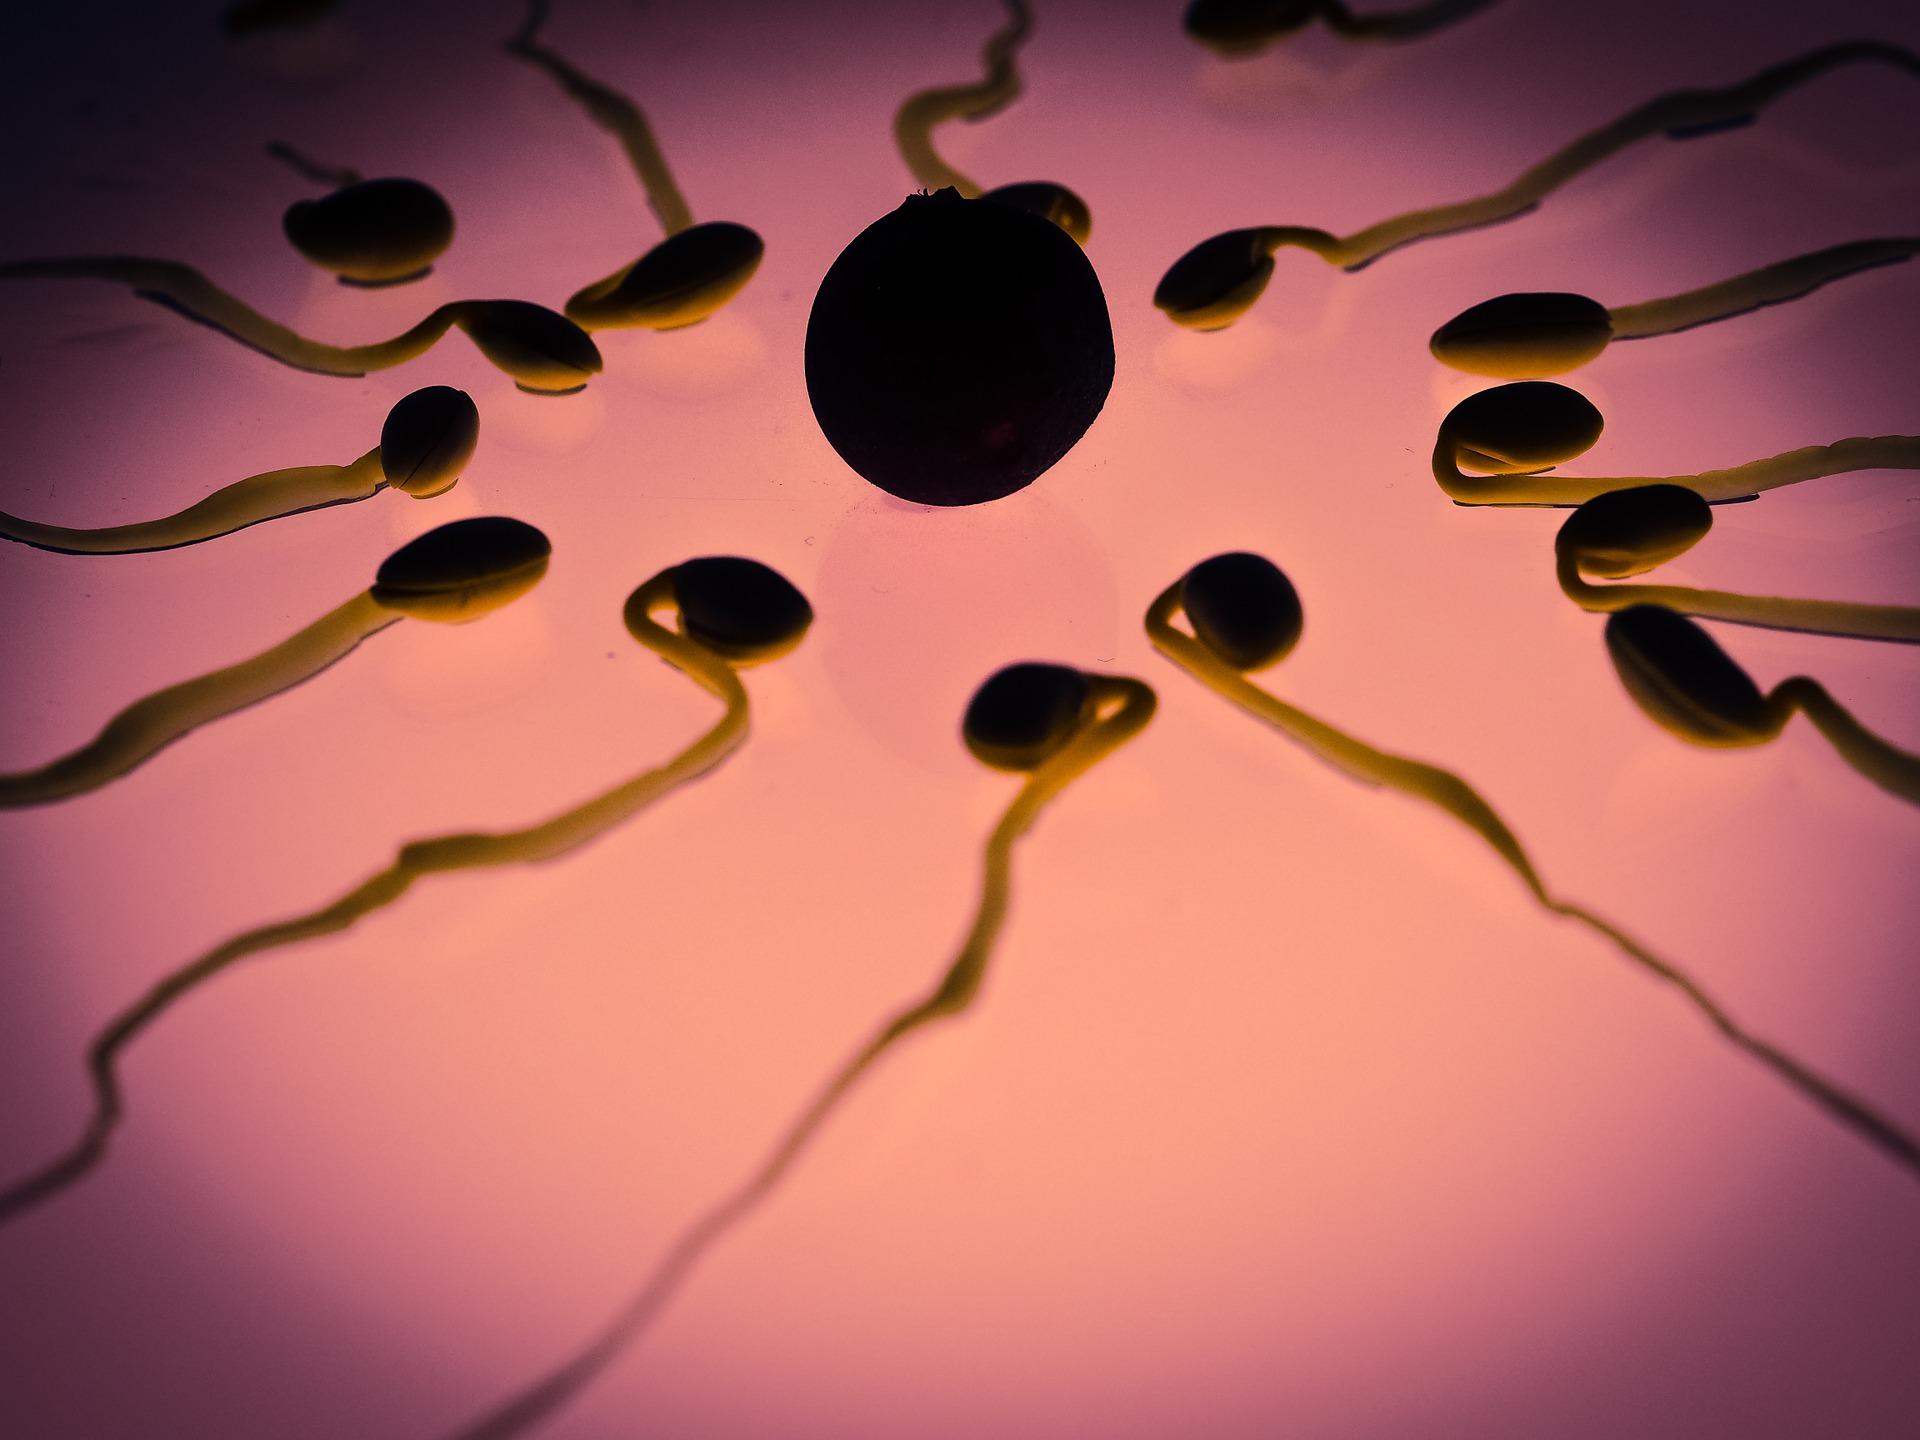 Víte, co nastartuje líné spermie k životu?